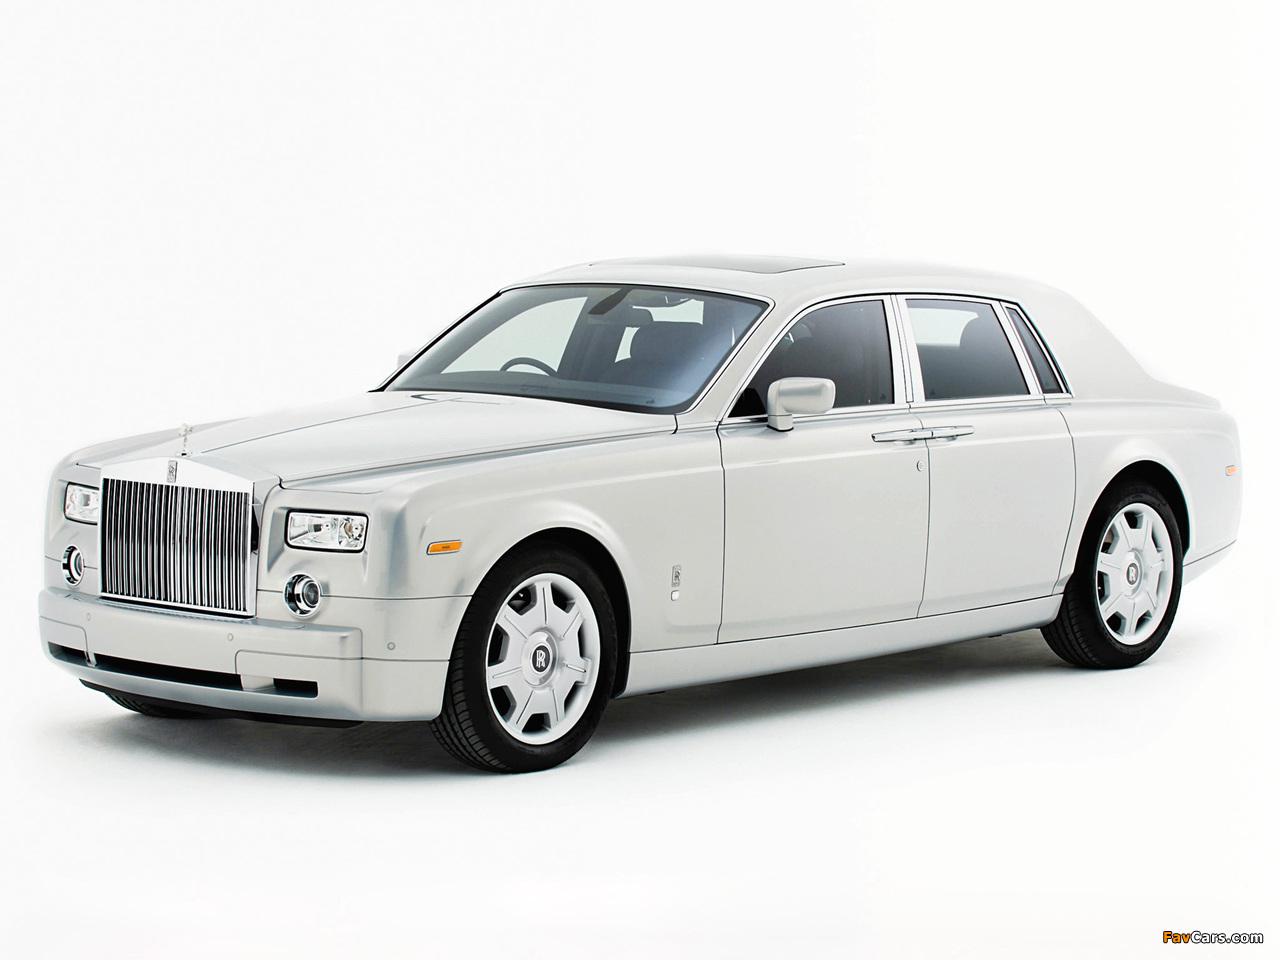 Rolls-Royce Phantom Silver Edition 2007 photos (1280 x 960)